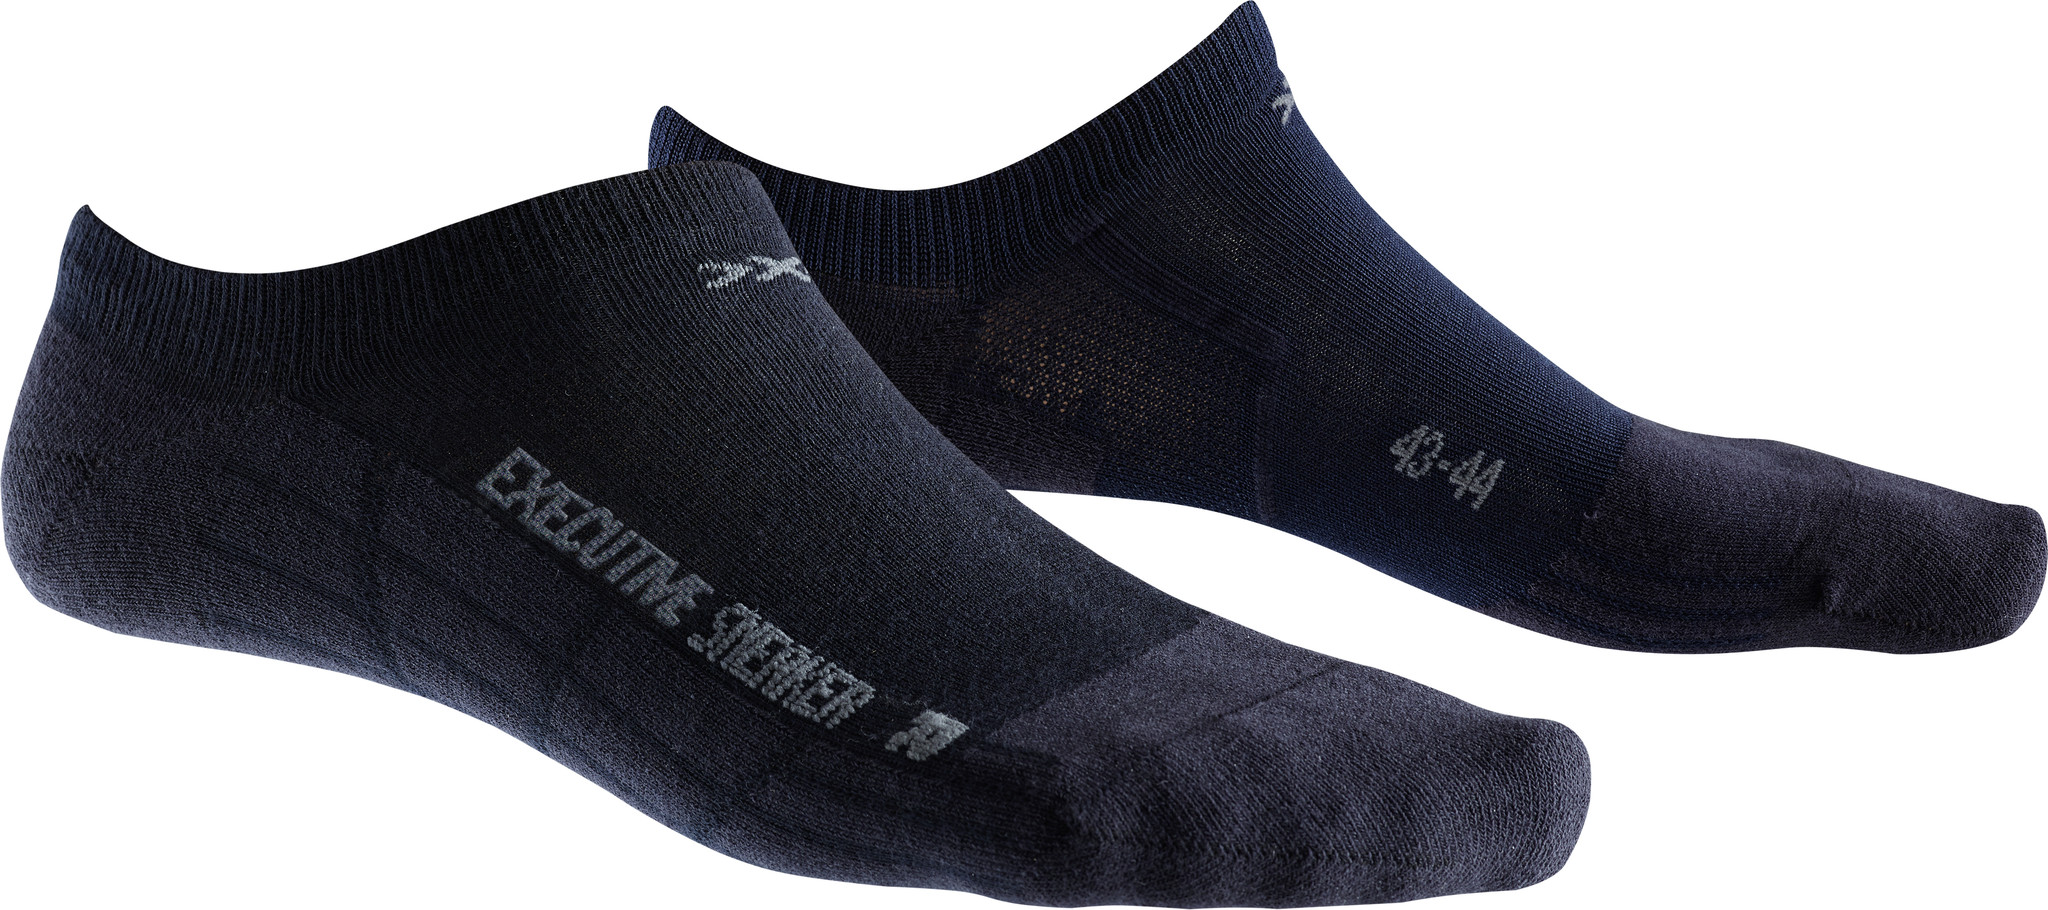 X-SOCKS Socken, Strümpfe Sneaker Executive Marine unisex von Gr. 39 - 46 S17-XS1